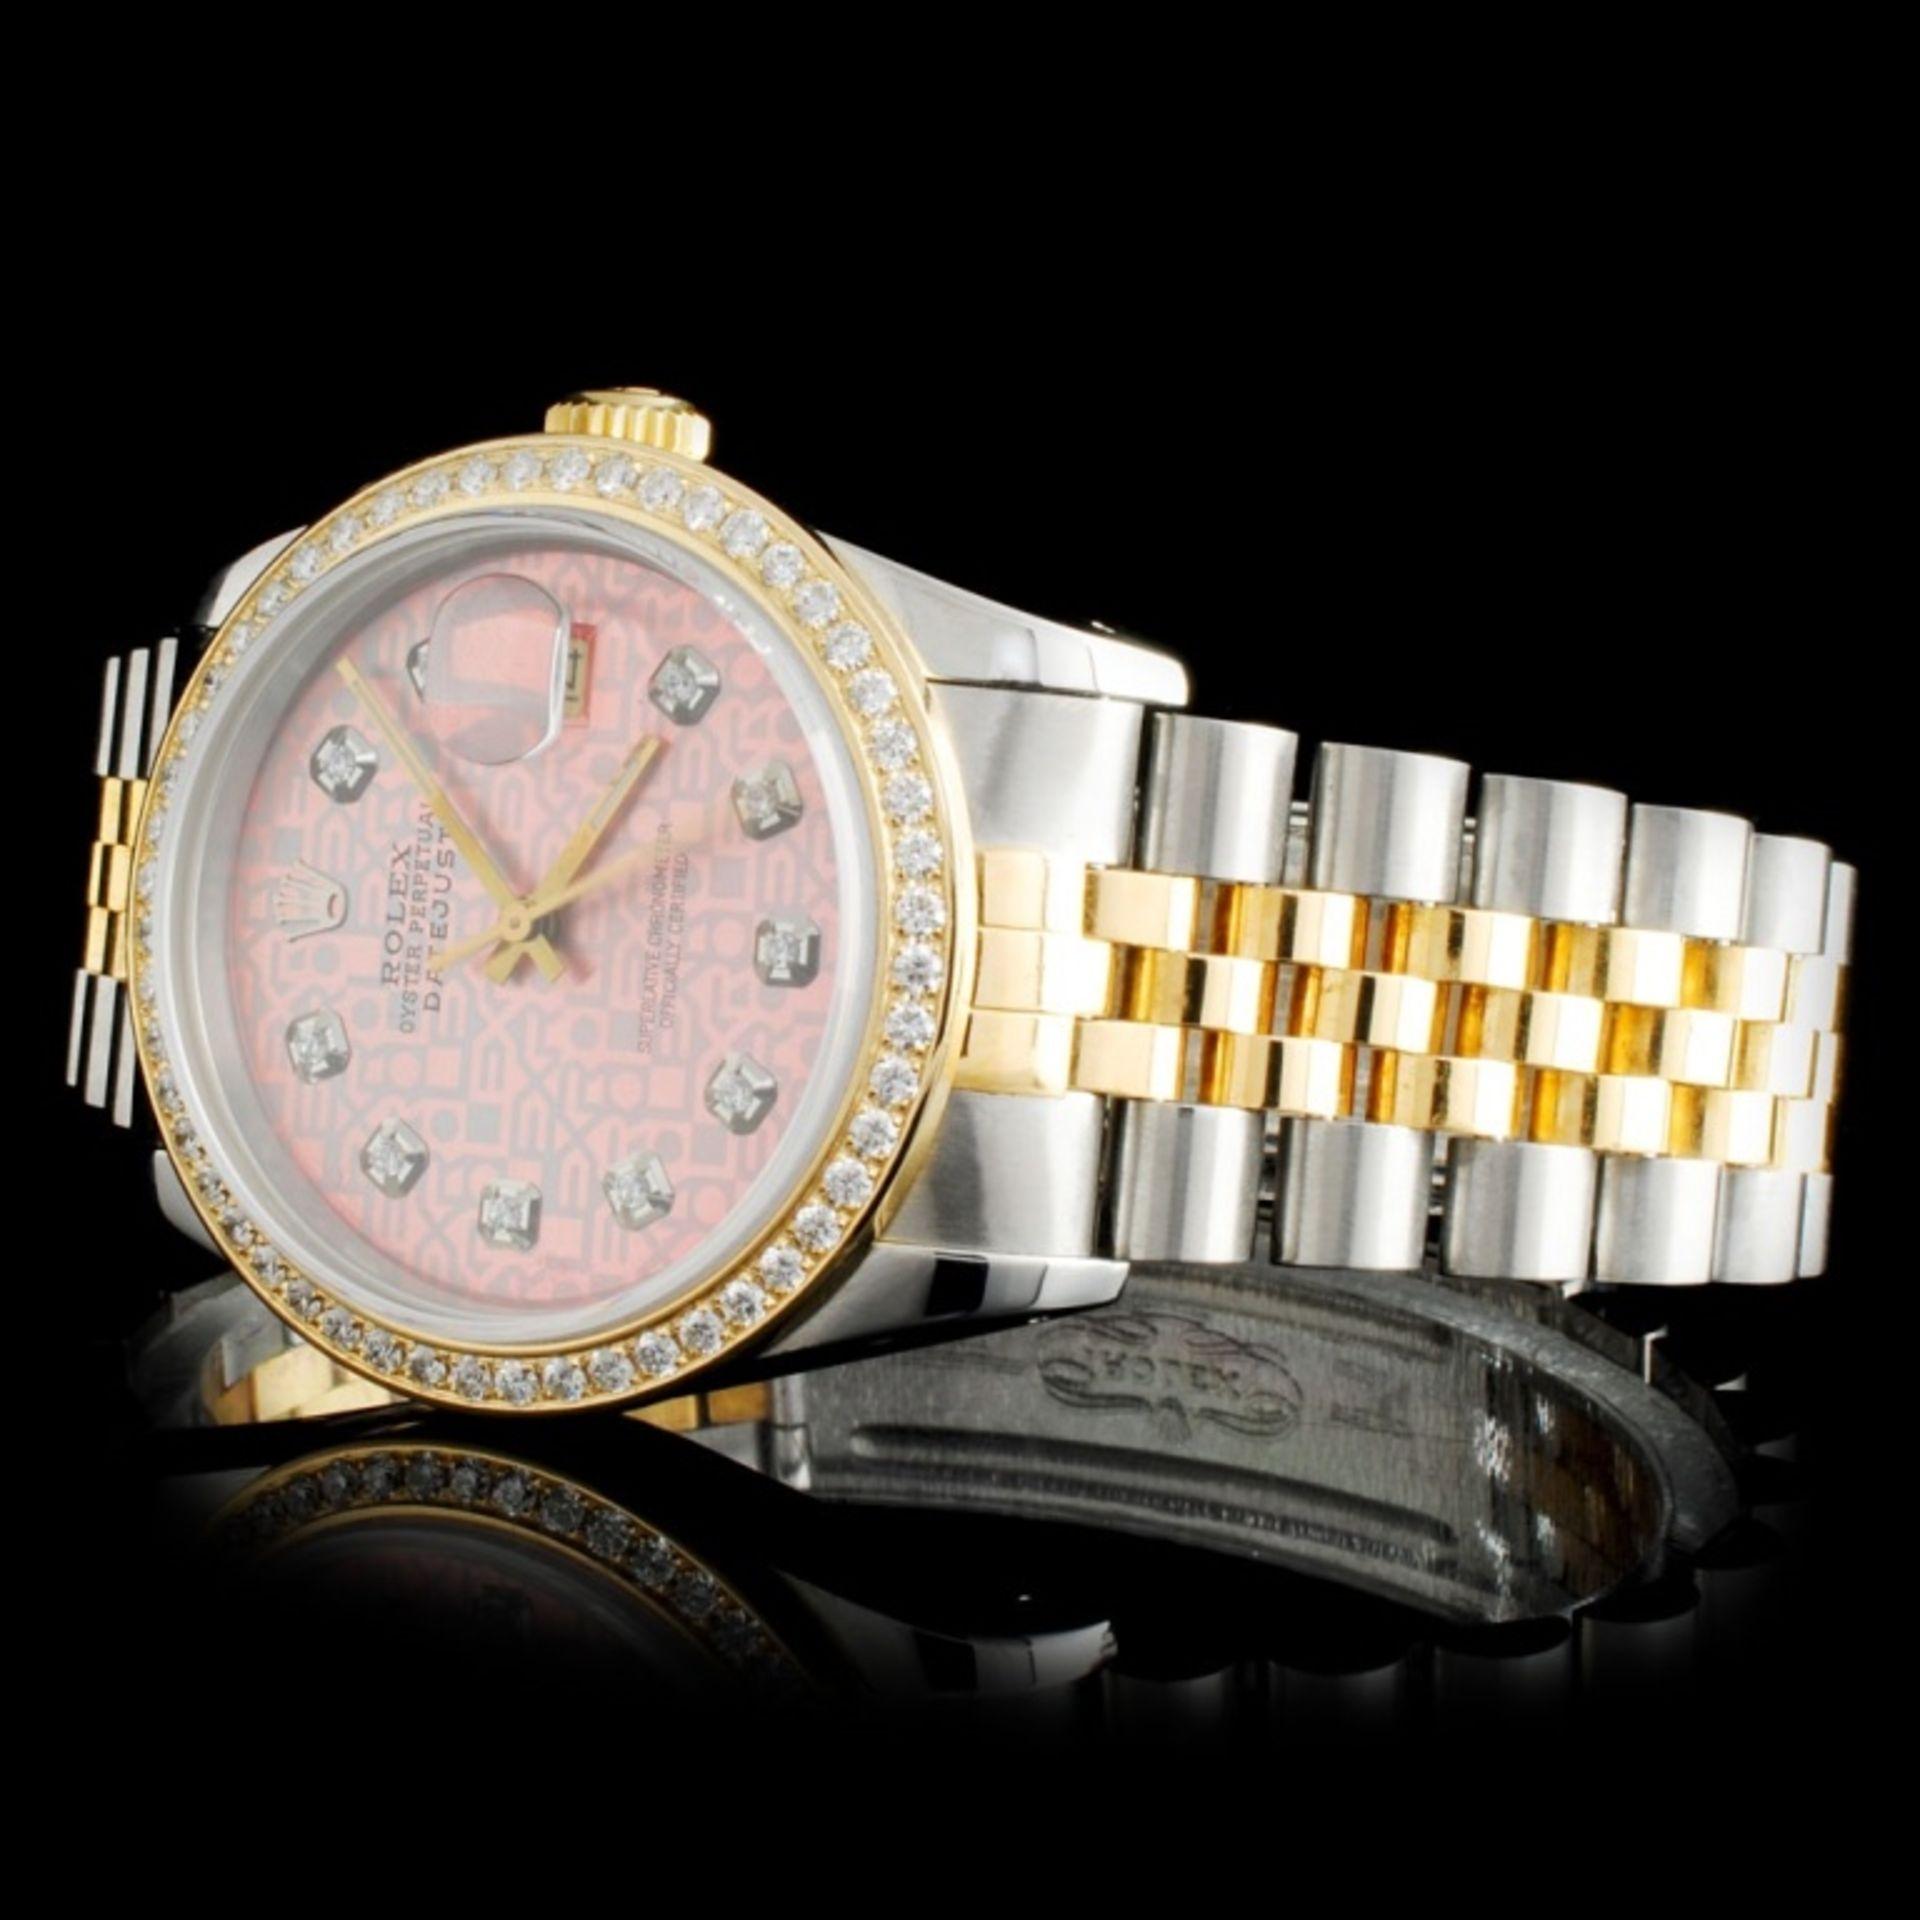 Rolex DateJust Diamond 36mm Wristwatch - Image 2 of 5